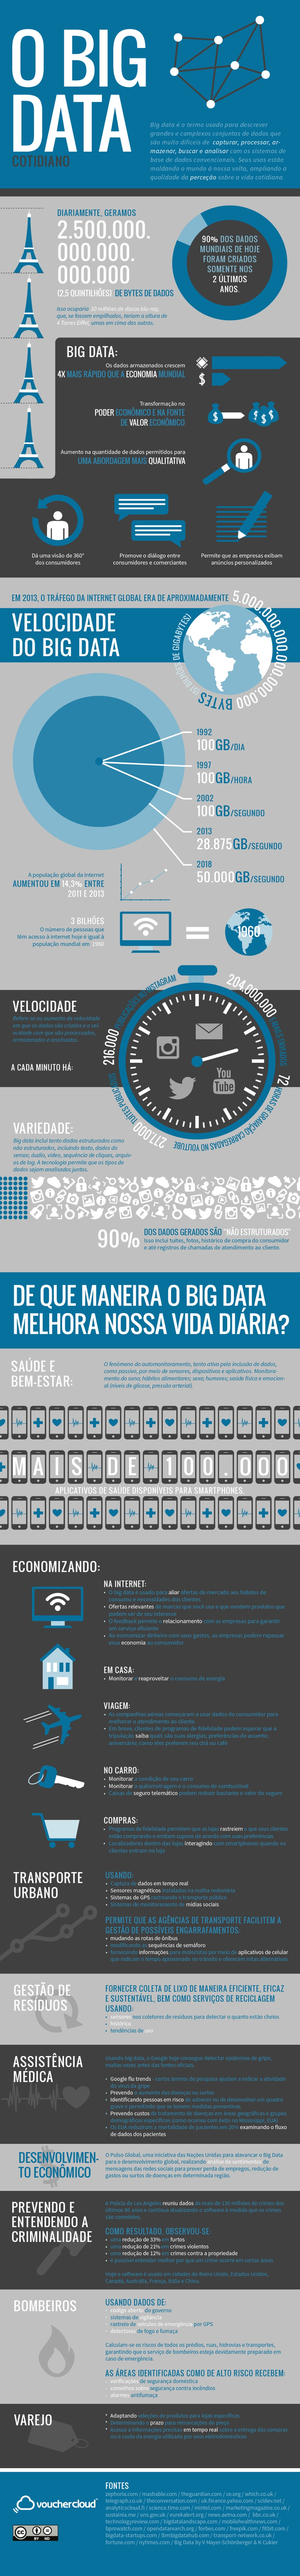 O Big Data Cotidiano - Infográfico